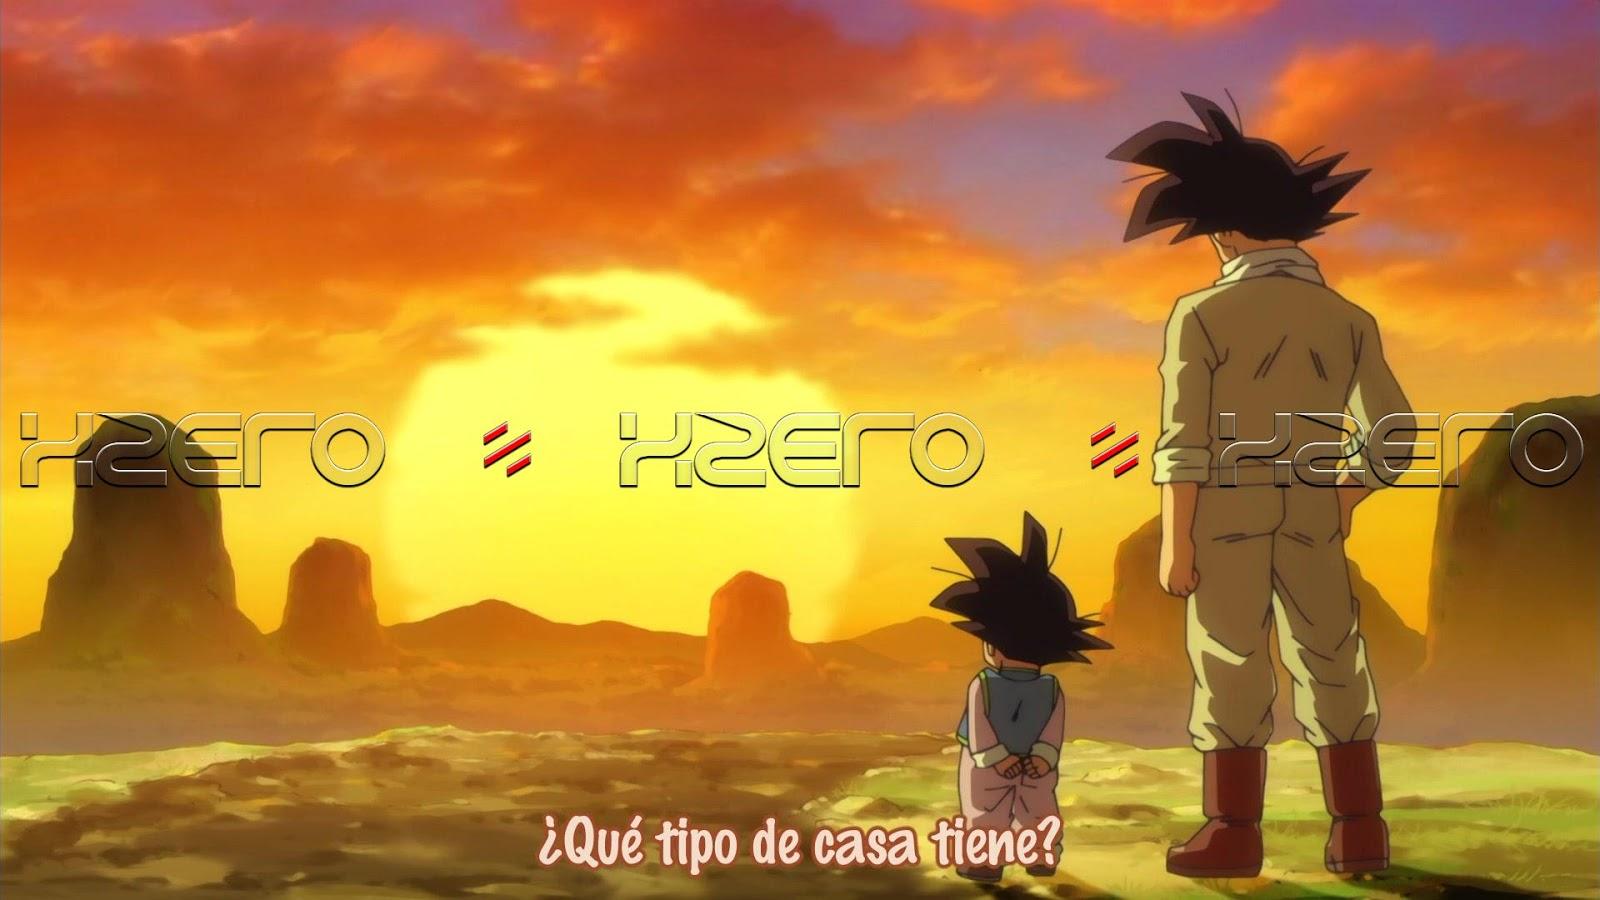 8 - Dragon Ball Super | Sub Español | BD + HD | Mega / 1fichier / Google